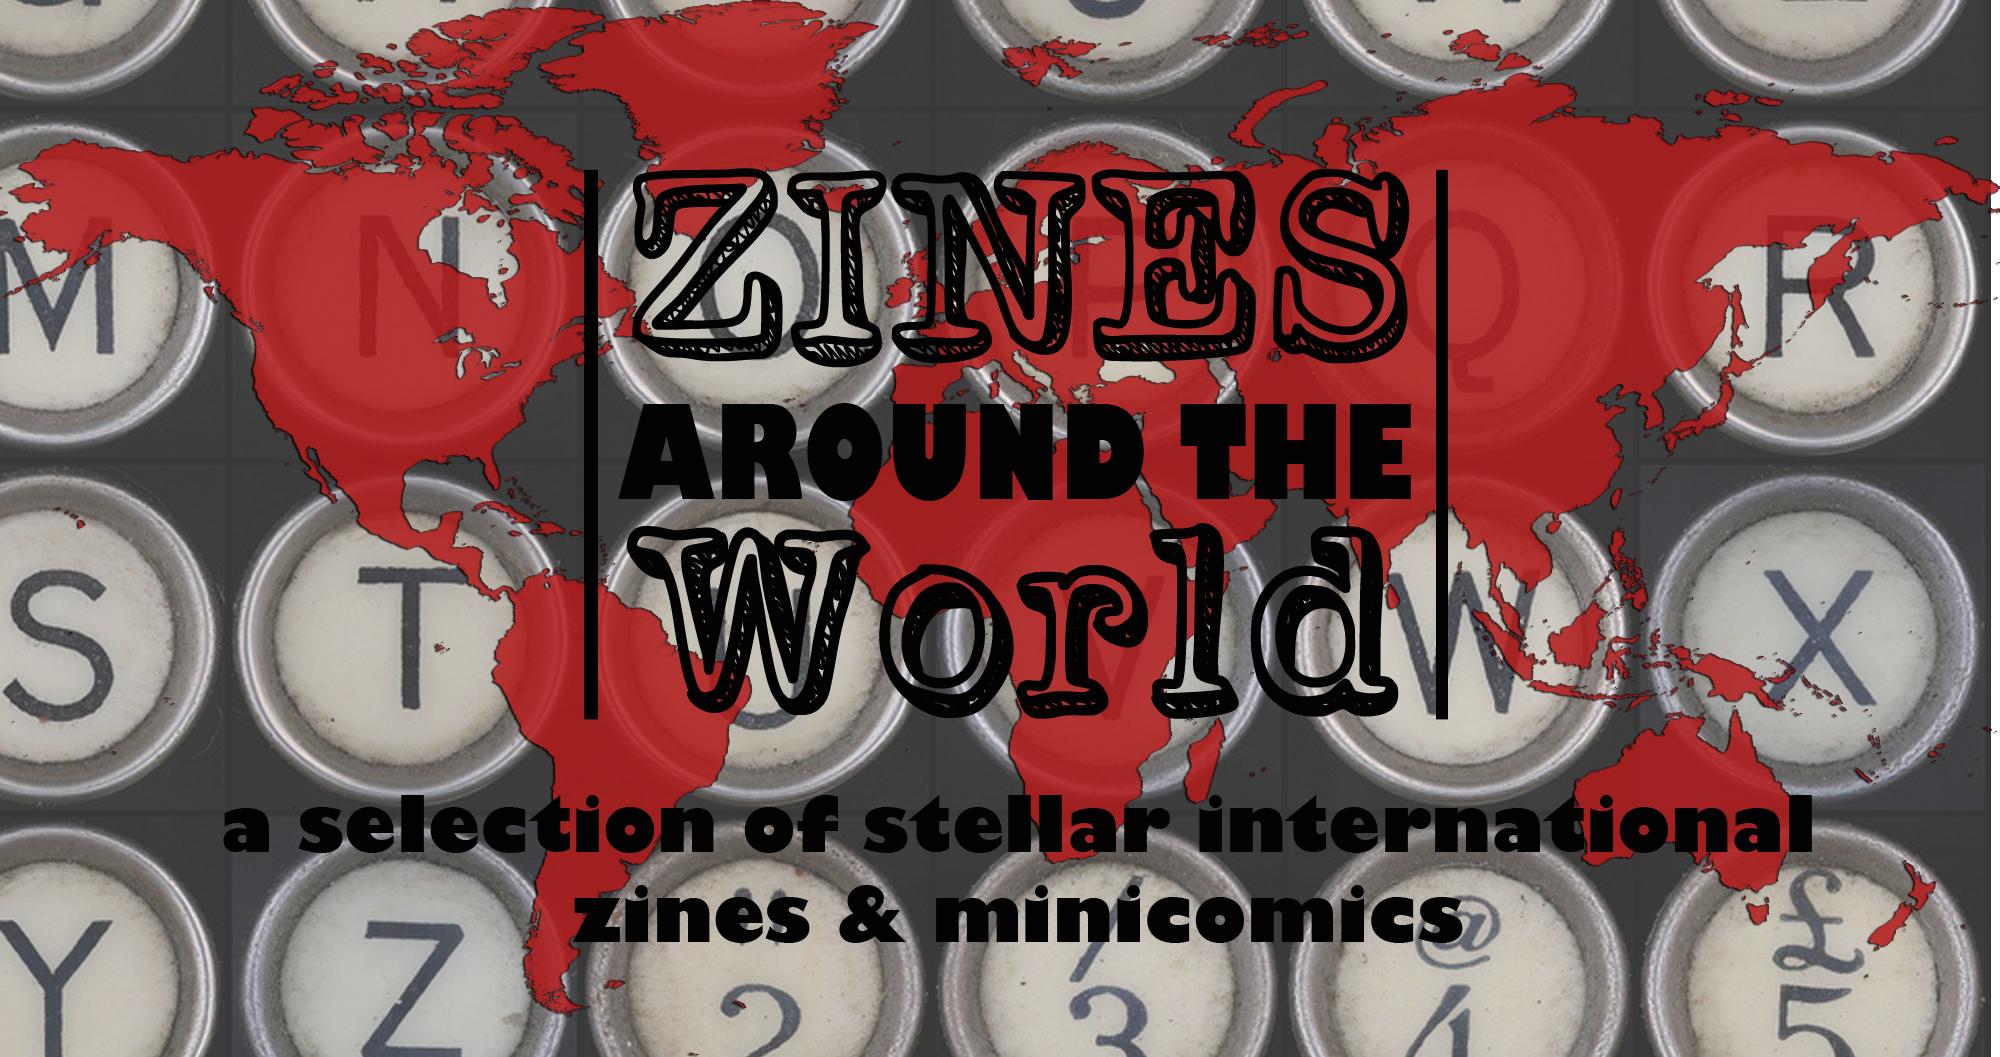 internationalzines